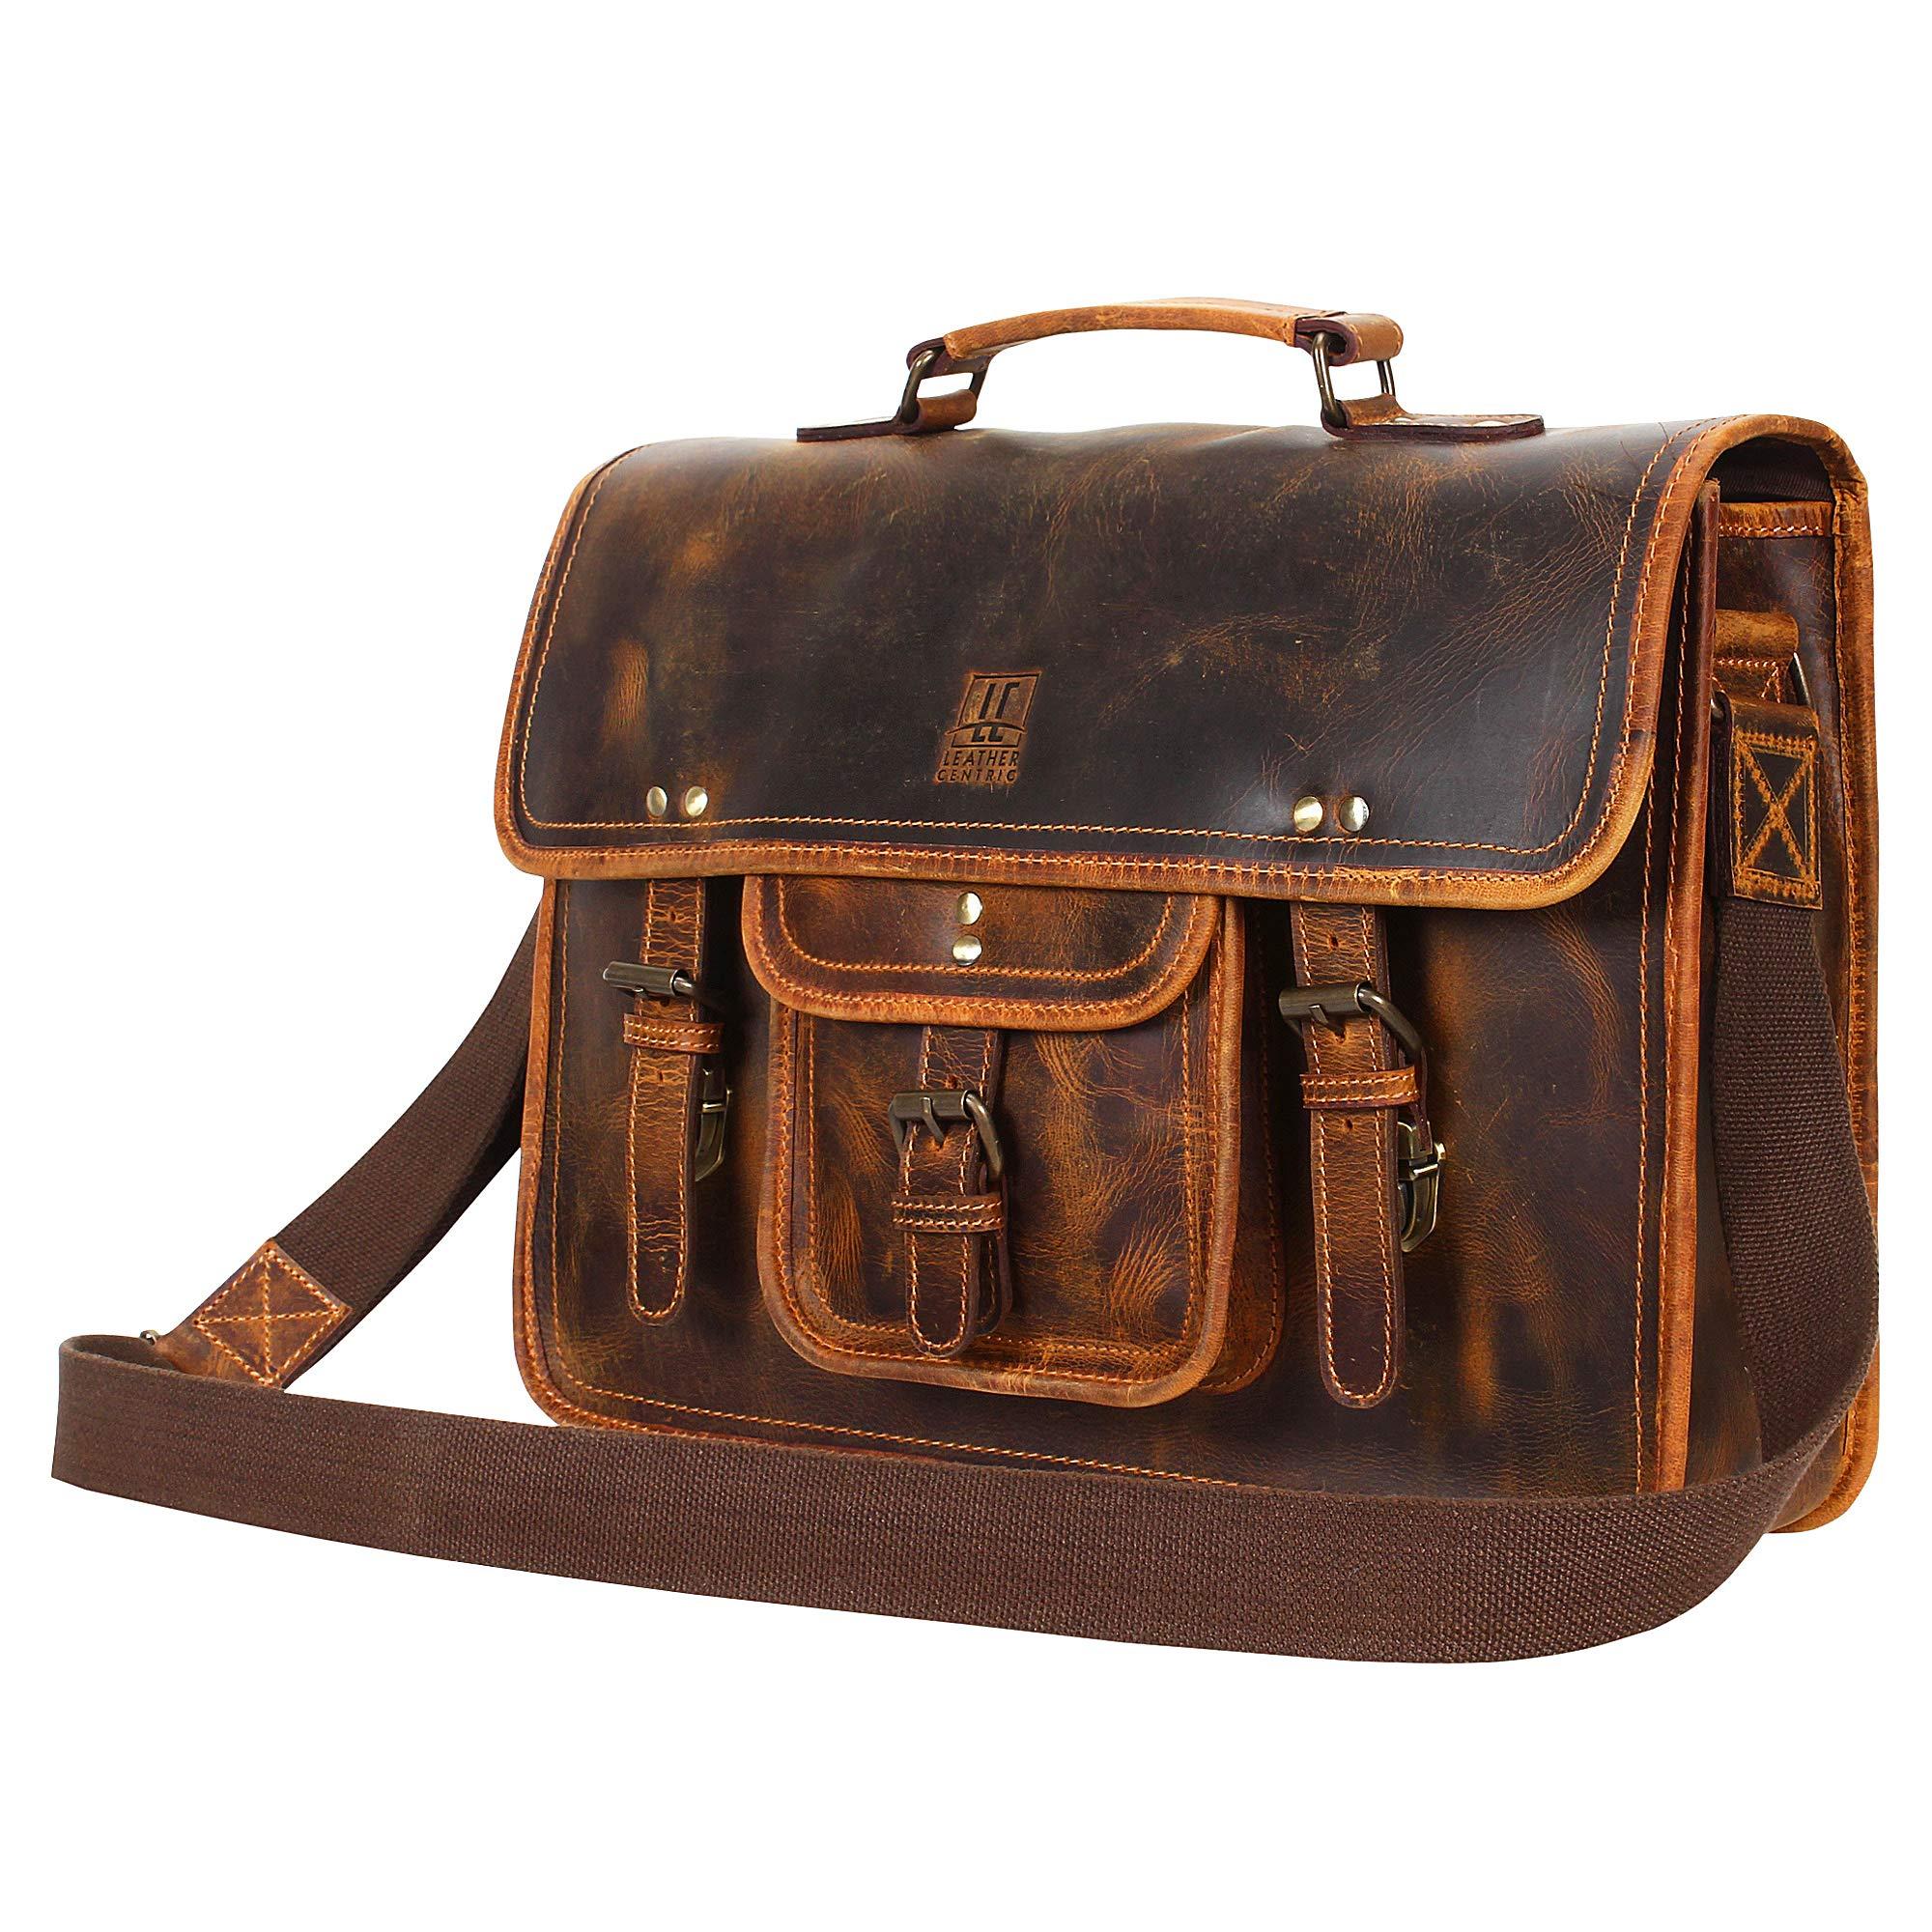 Leather Centric Office Laptop Briefcase Satchel Bag